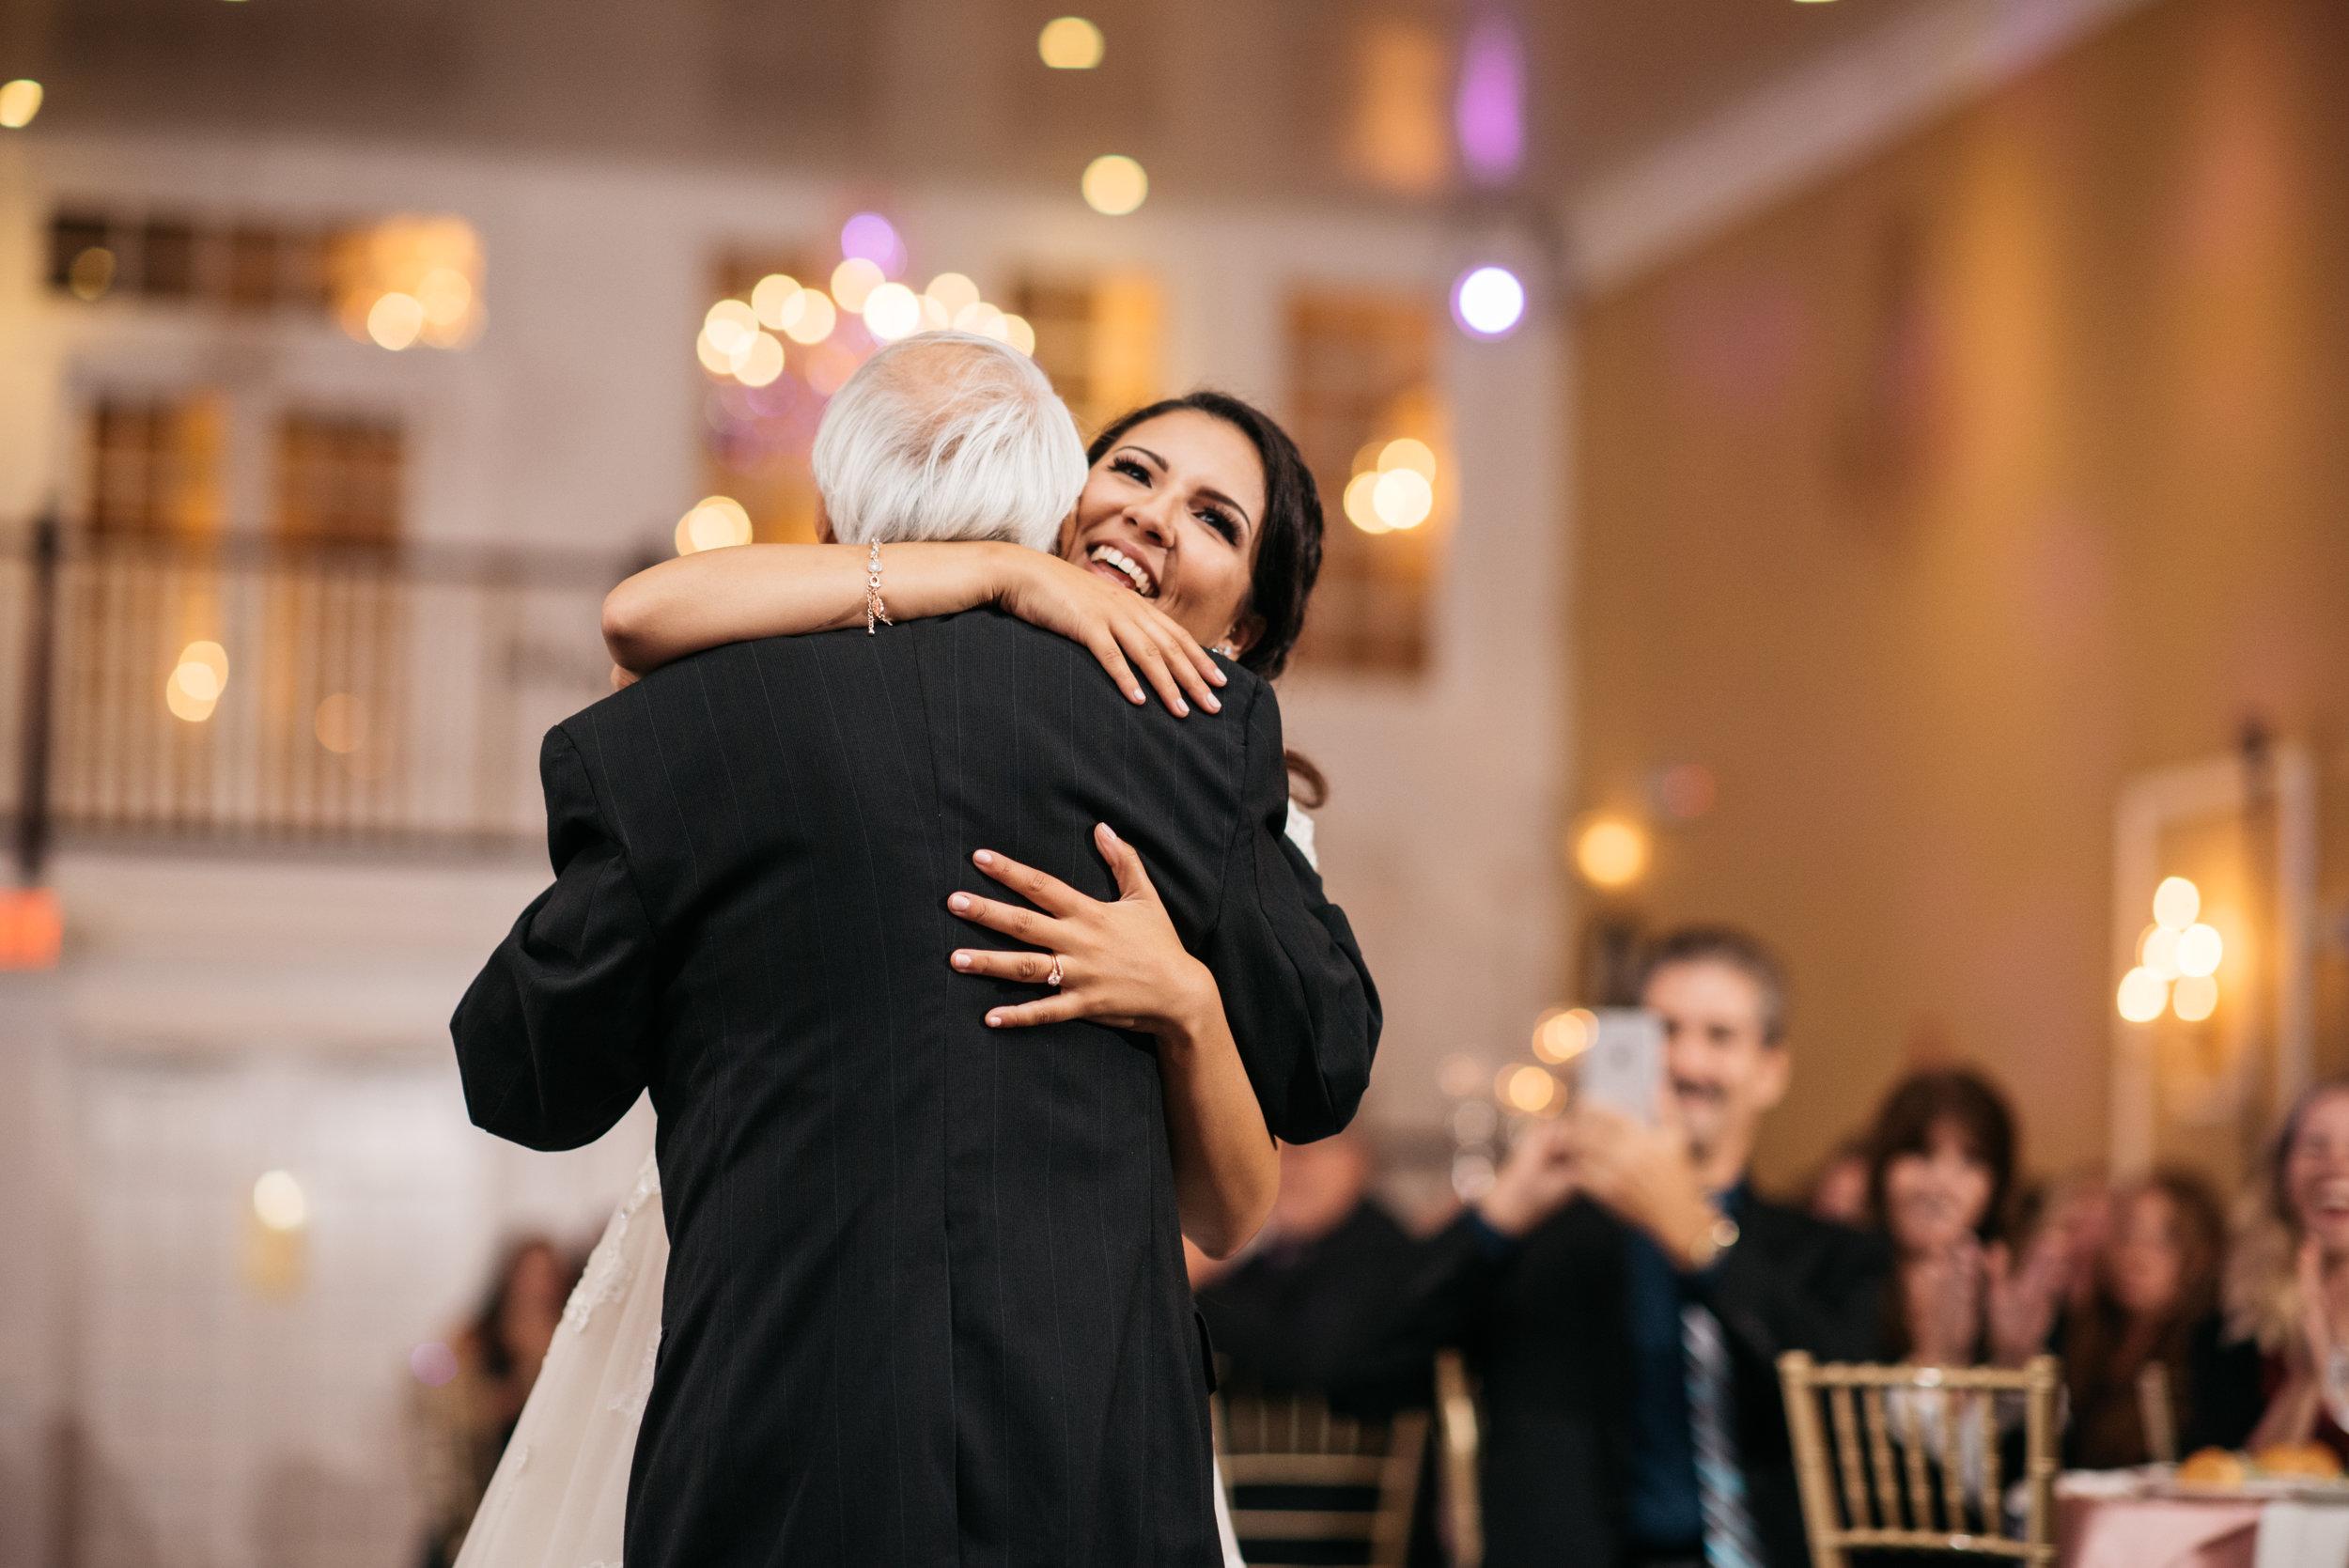 WeddingPhotos | NJPhotographer | Highlights-7-20.jpg